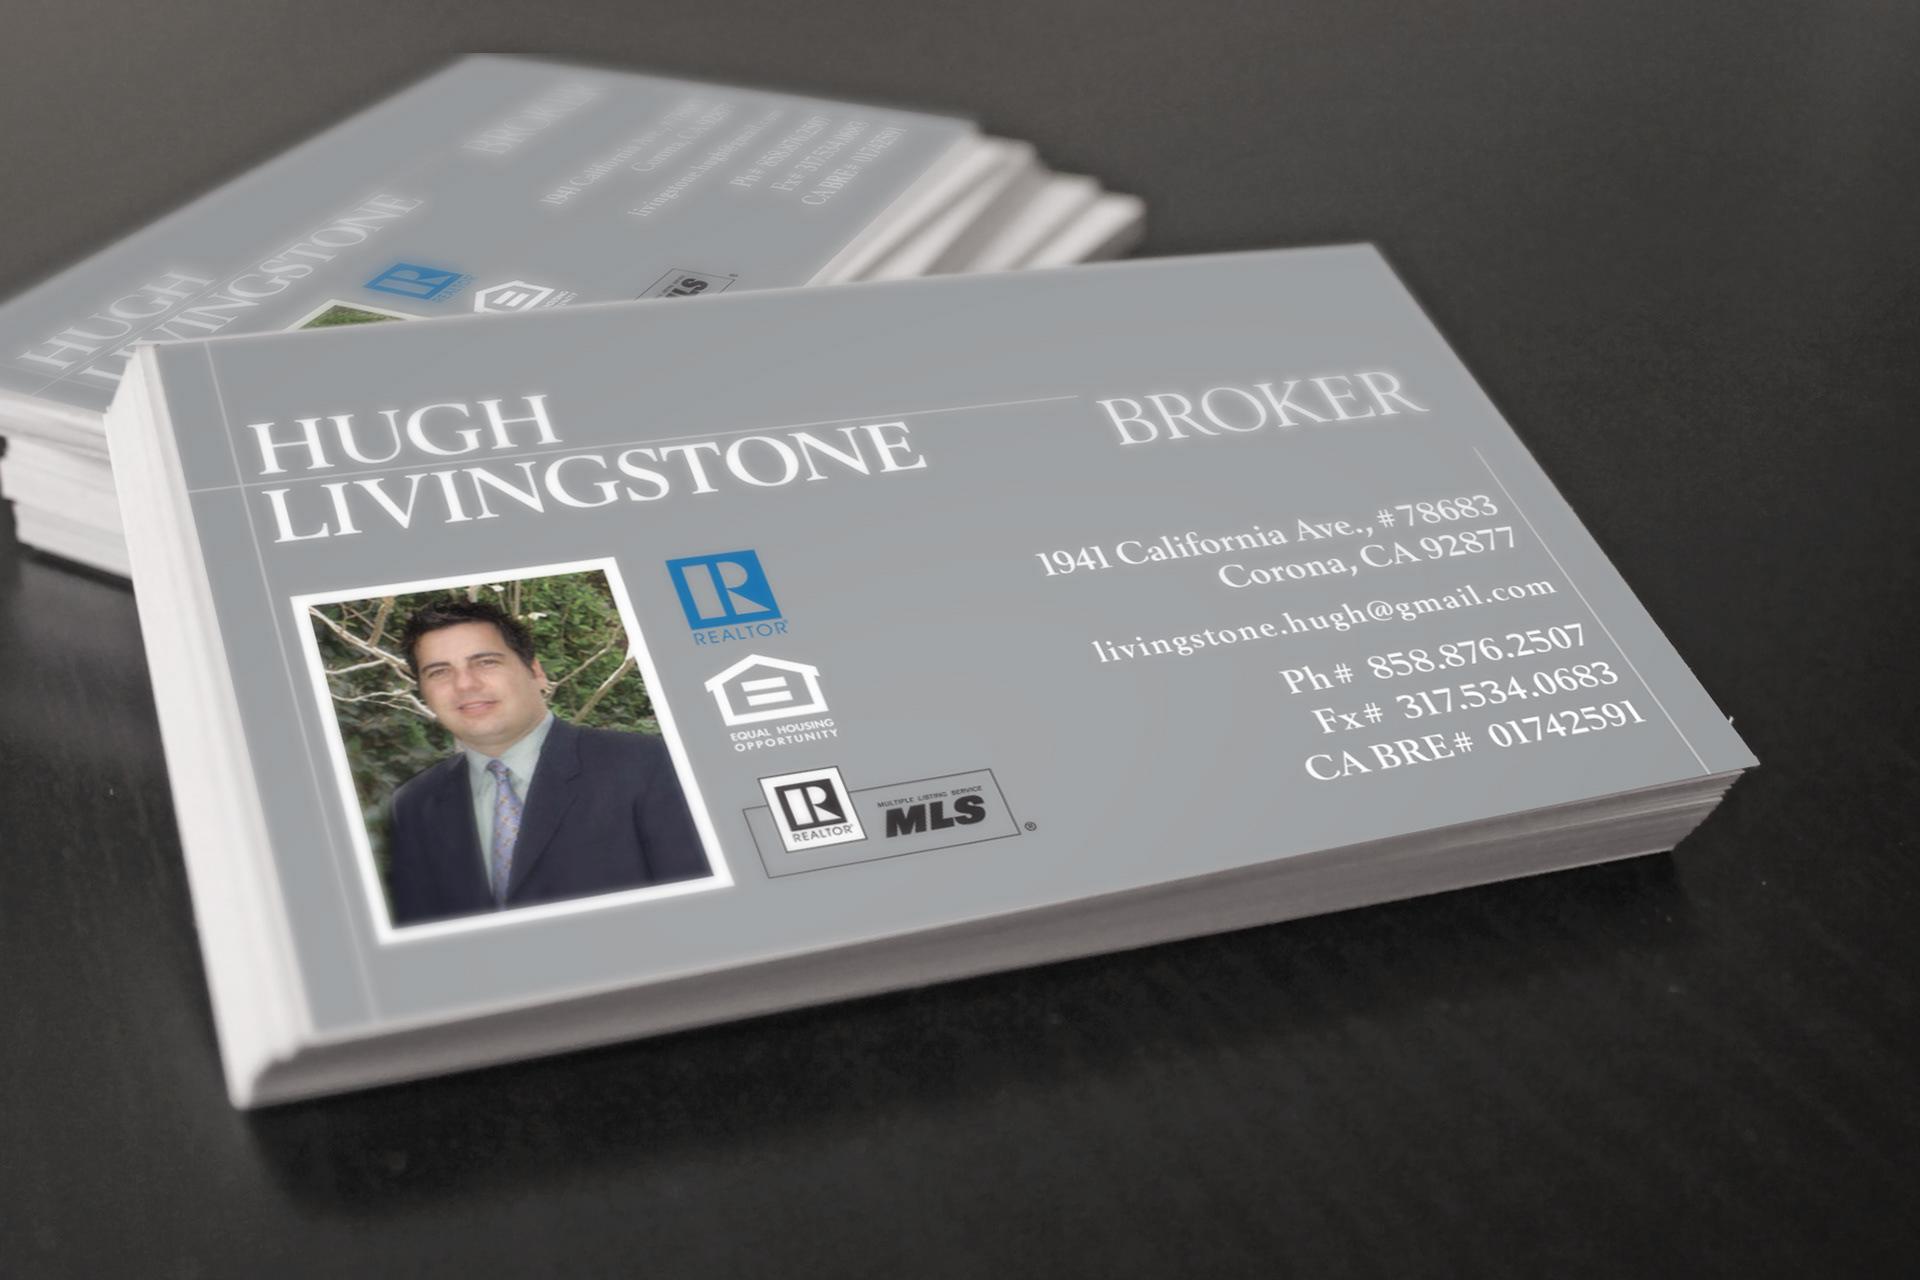 Greg cisneros goyo creative branding h livingstone real business card 1 reheart Choice Image